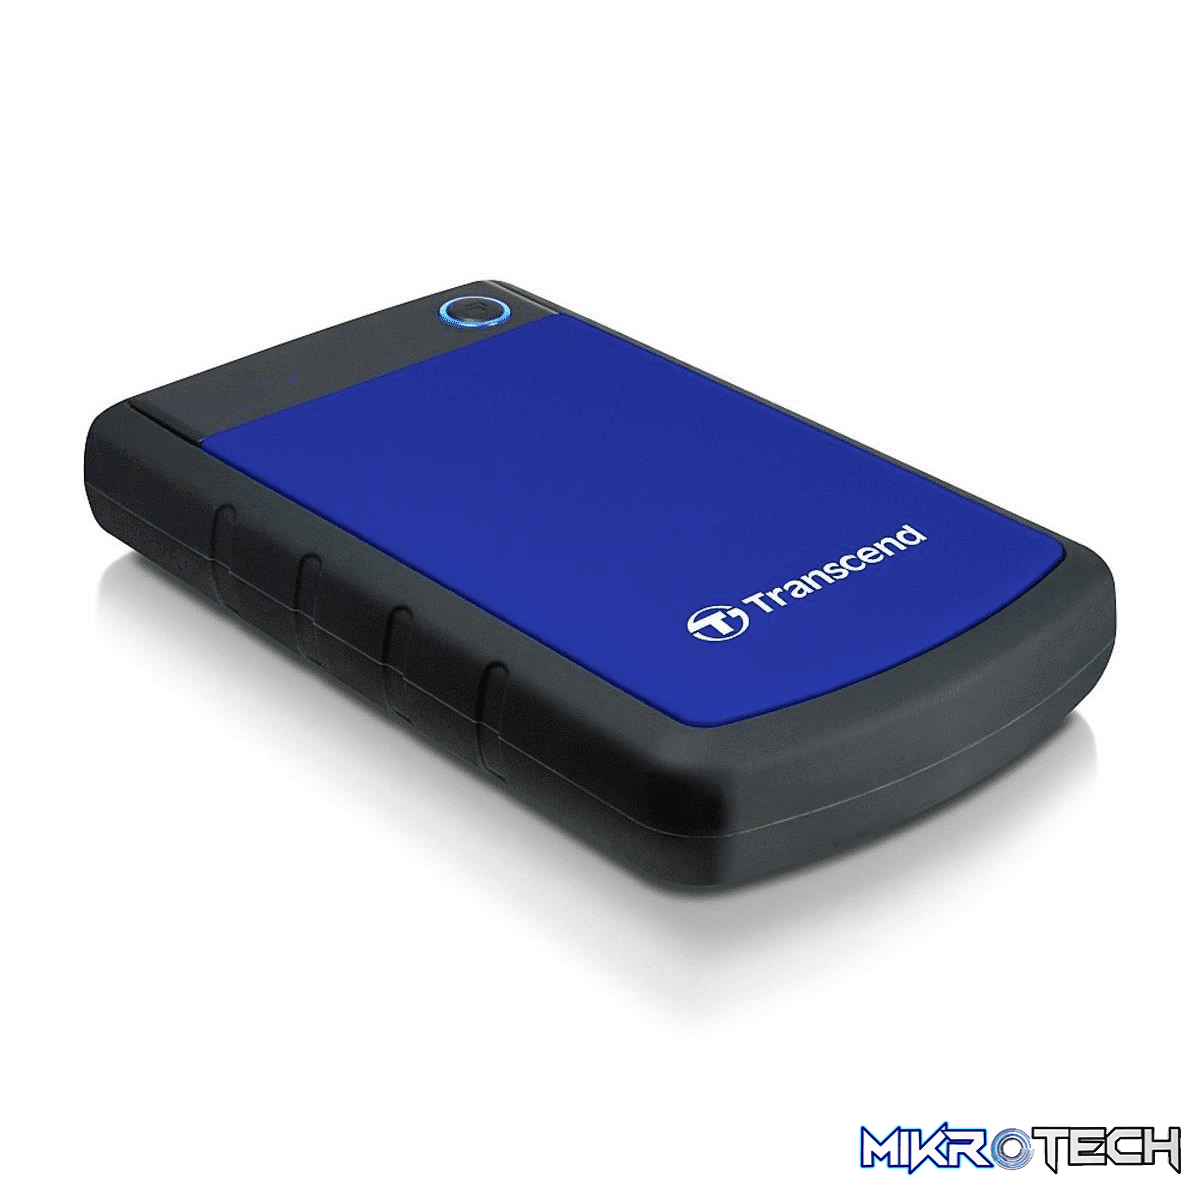 Transcend StoreJet 25H3 2TB Blue External Hard Drive TS2TSJ25H3B